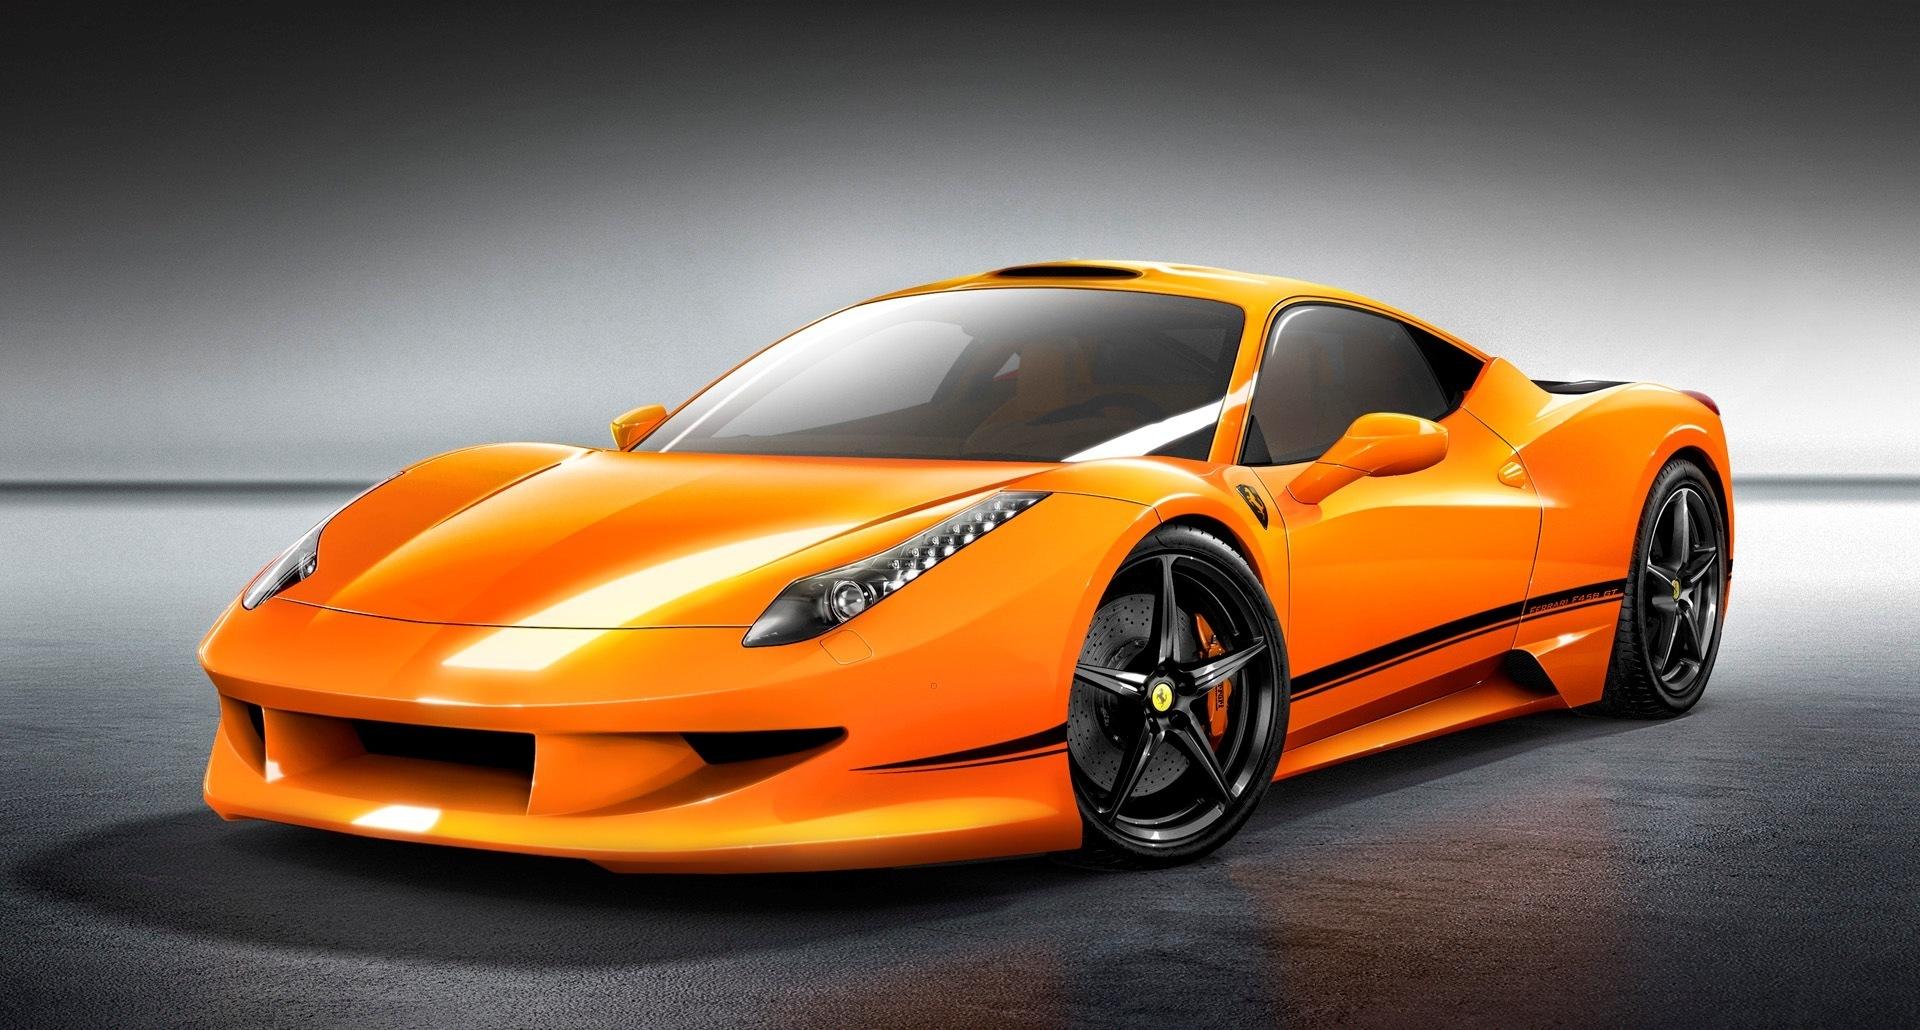 Ferrari Cars 11 Hd Wallpaper